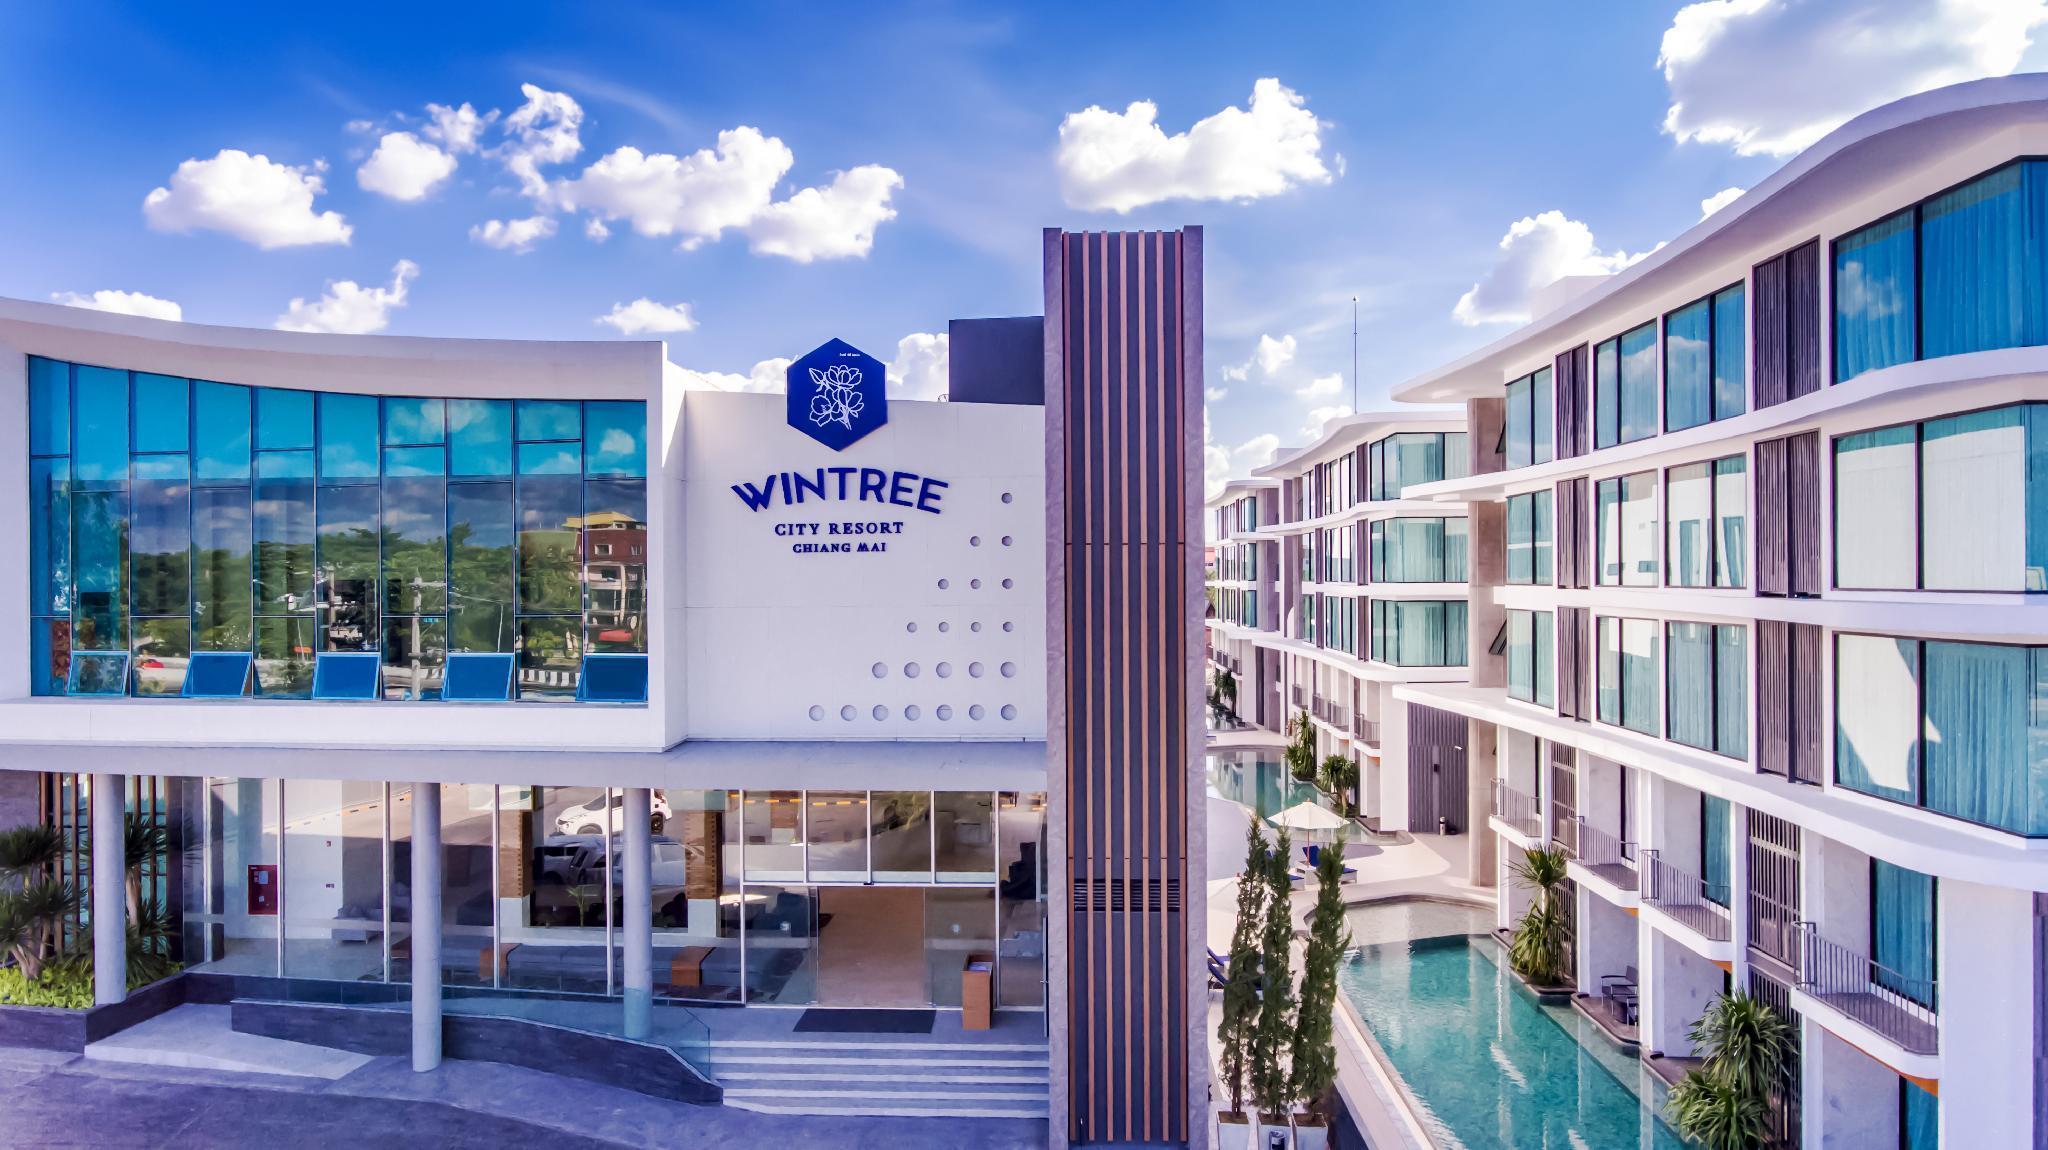 Wintree City Resort Chiang Mai วินทรี ซิตี้ รีสอร์ต เชียงใหม่